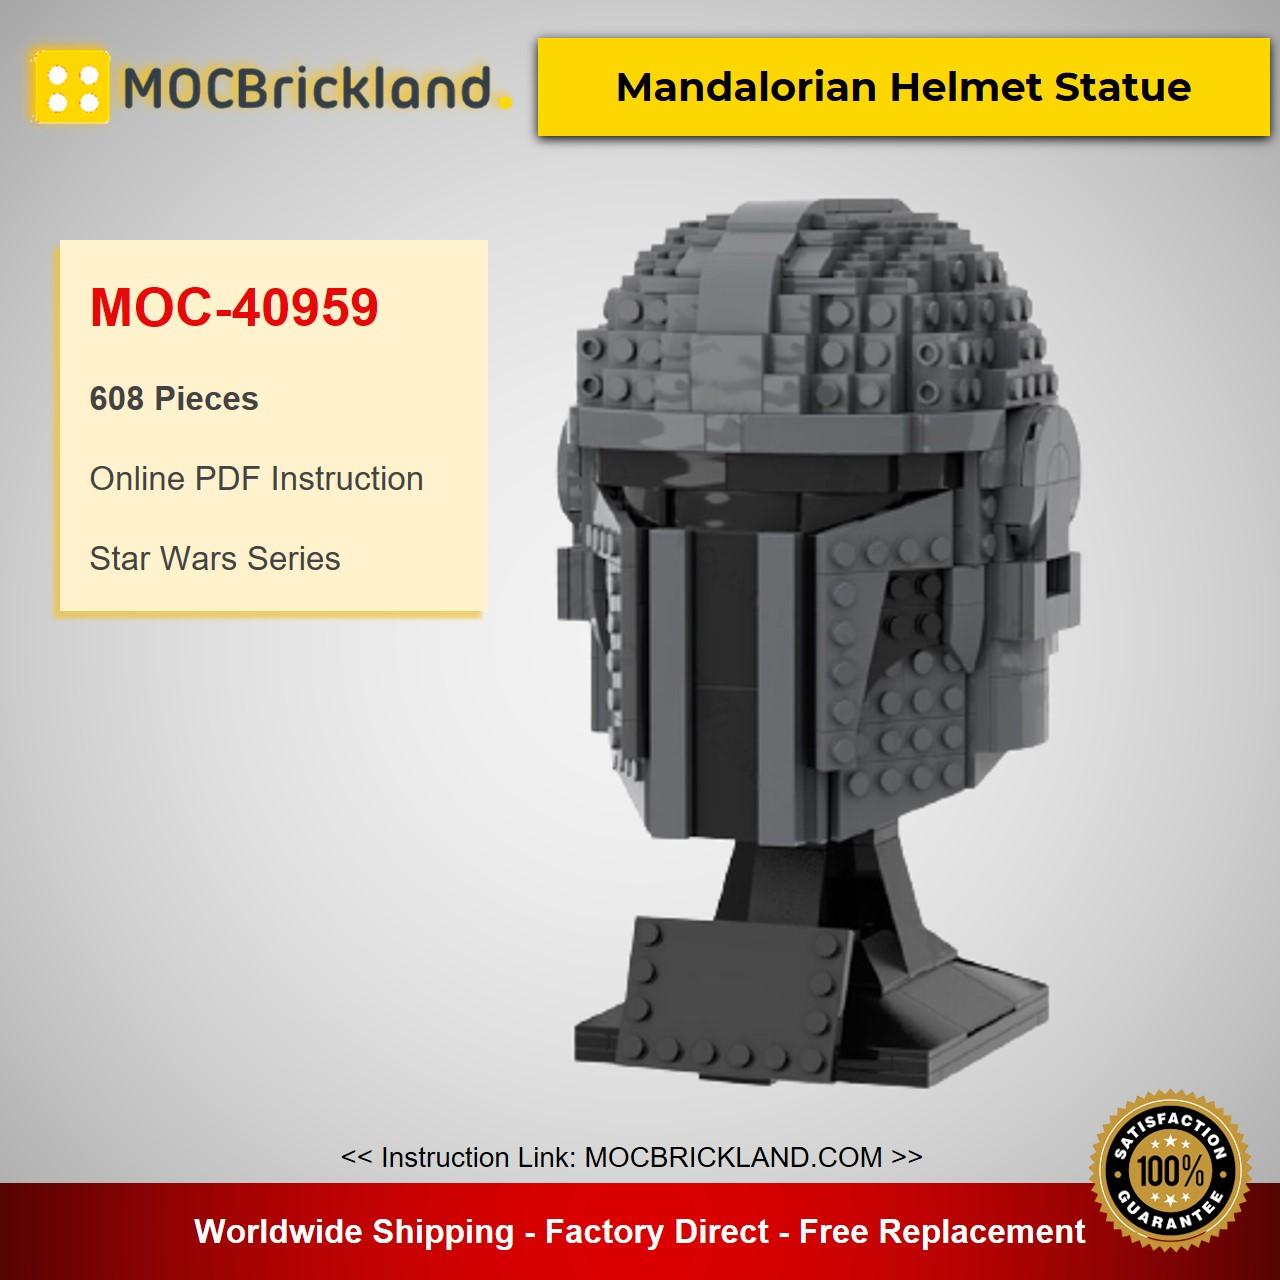 MOC-40959 Star Wars Mandalorian Helmet Statue Designed By zonilug With 608 Pieces